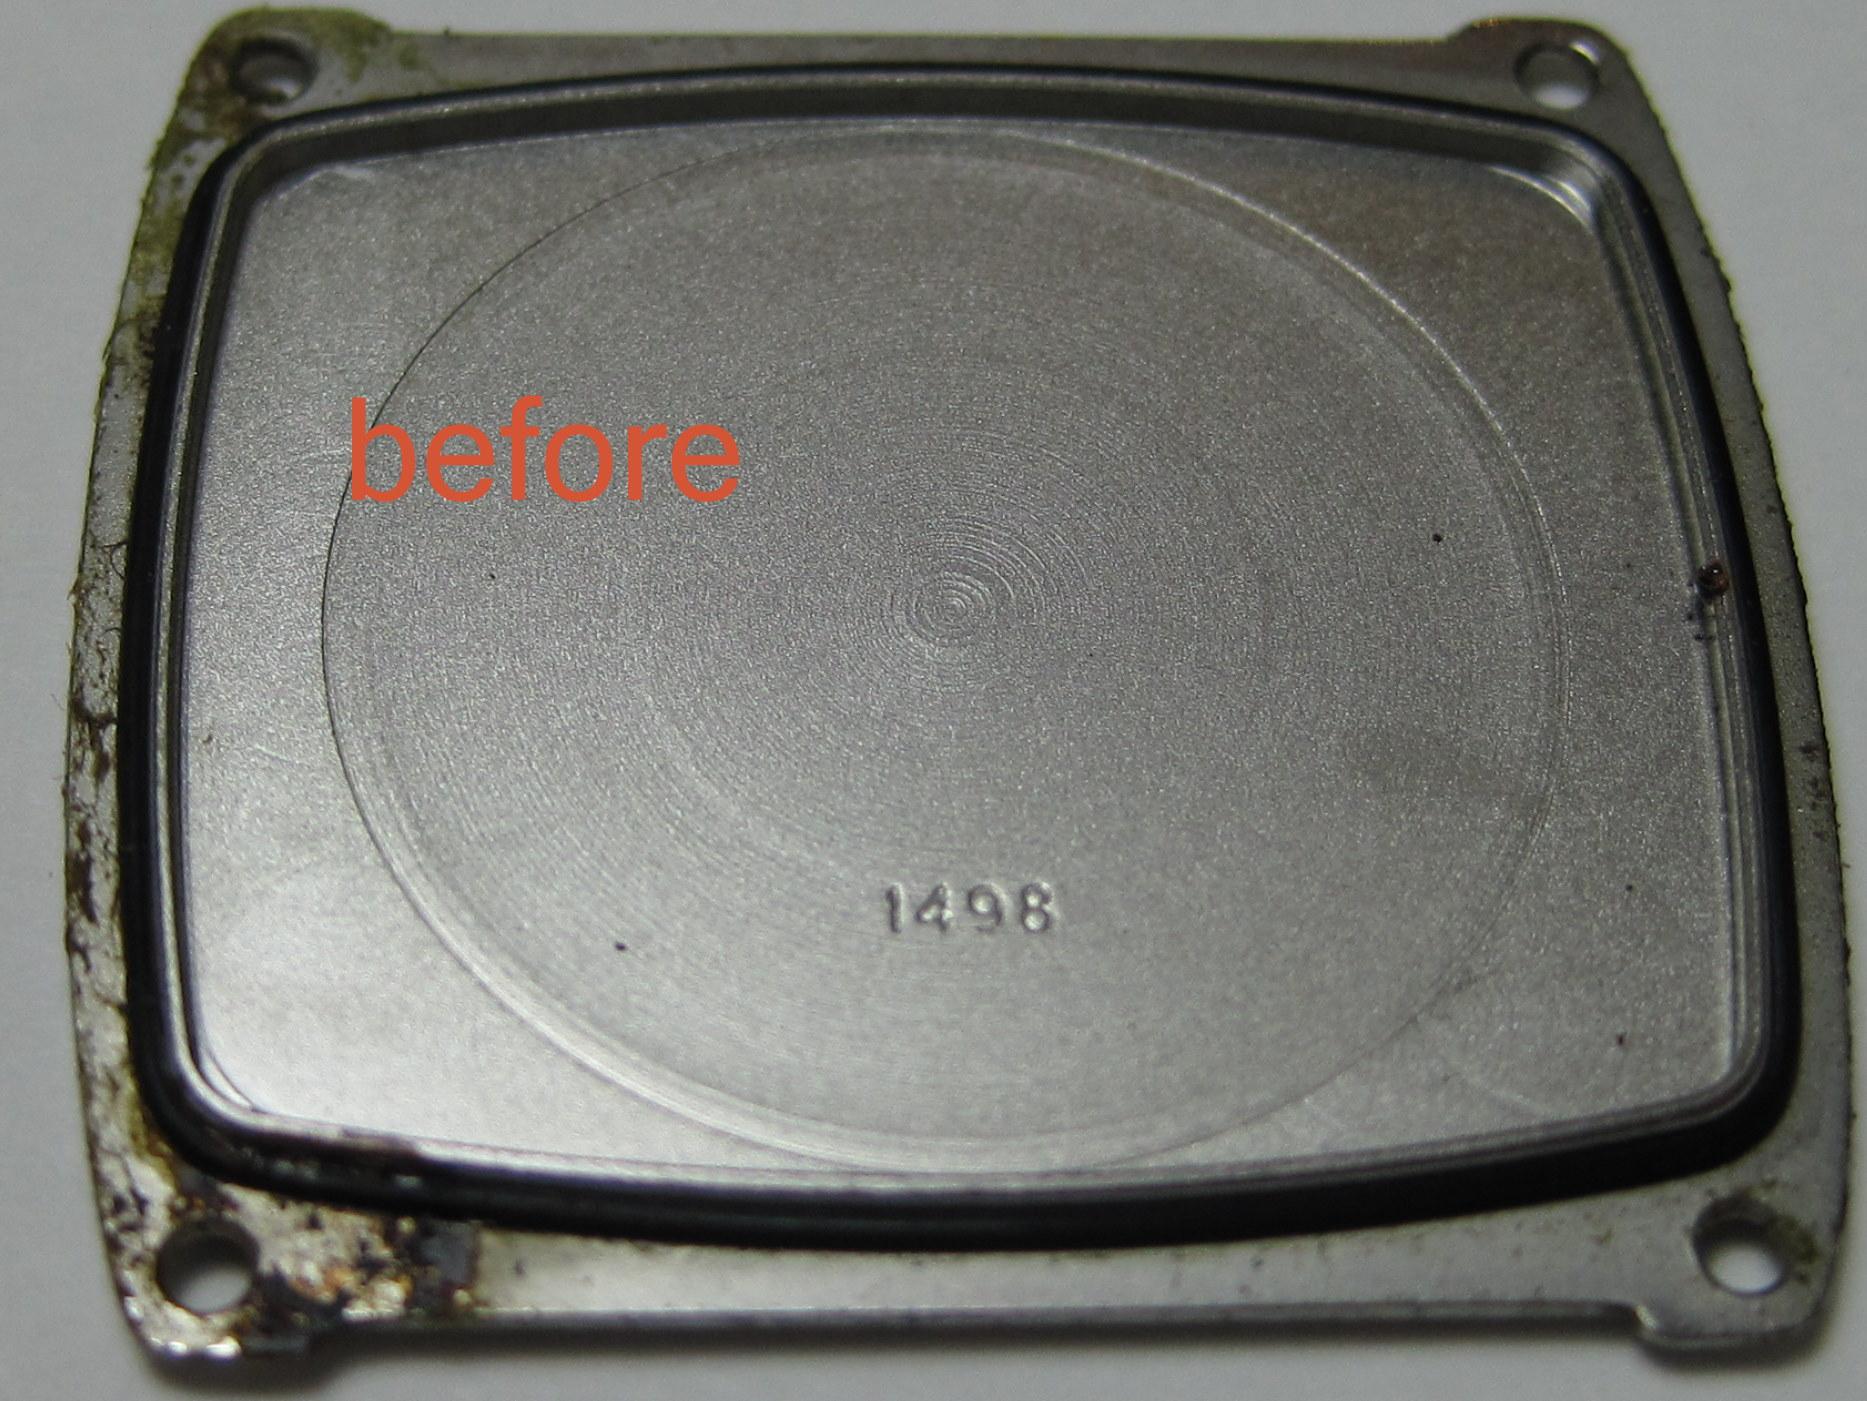 e816701b43 時計クリーニング.COM / ビフォー&アフター : グッチ GUCCI 電池交換 ...